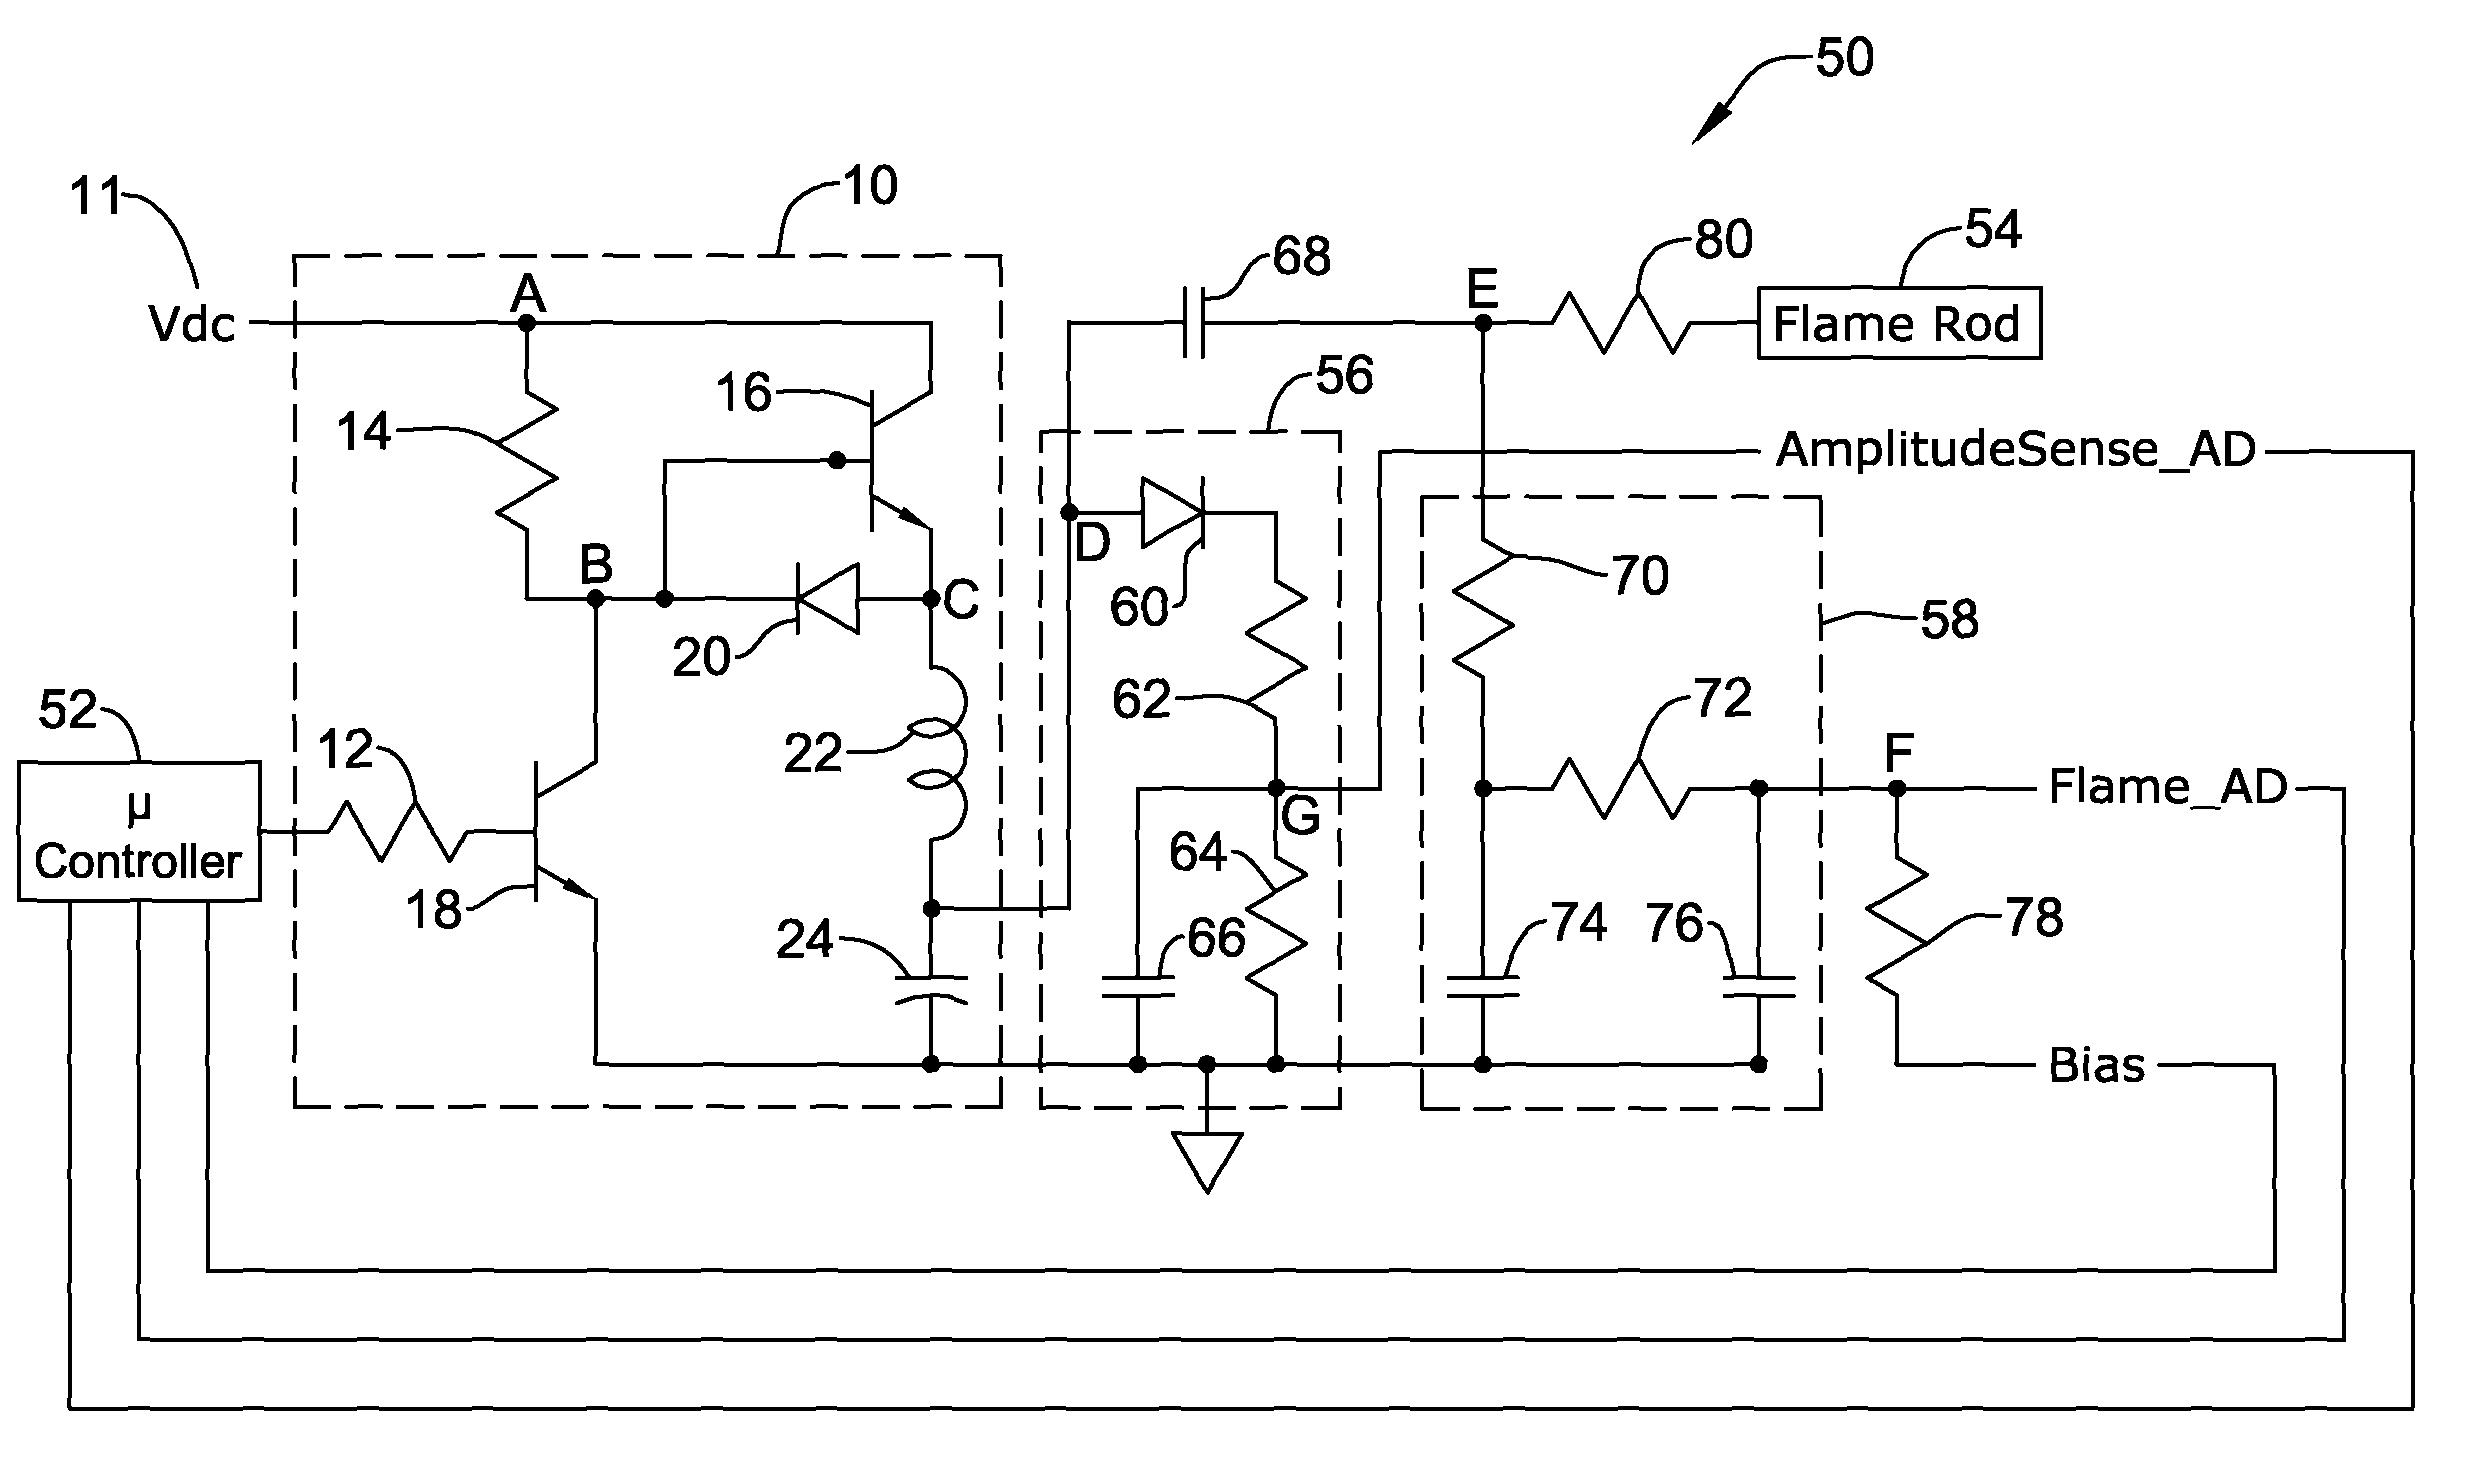 Flame Sensor Wiring Diagram : 27 Wiring Diagram Images